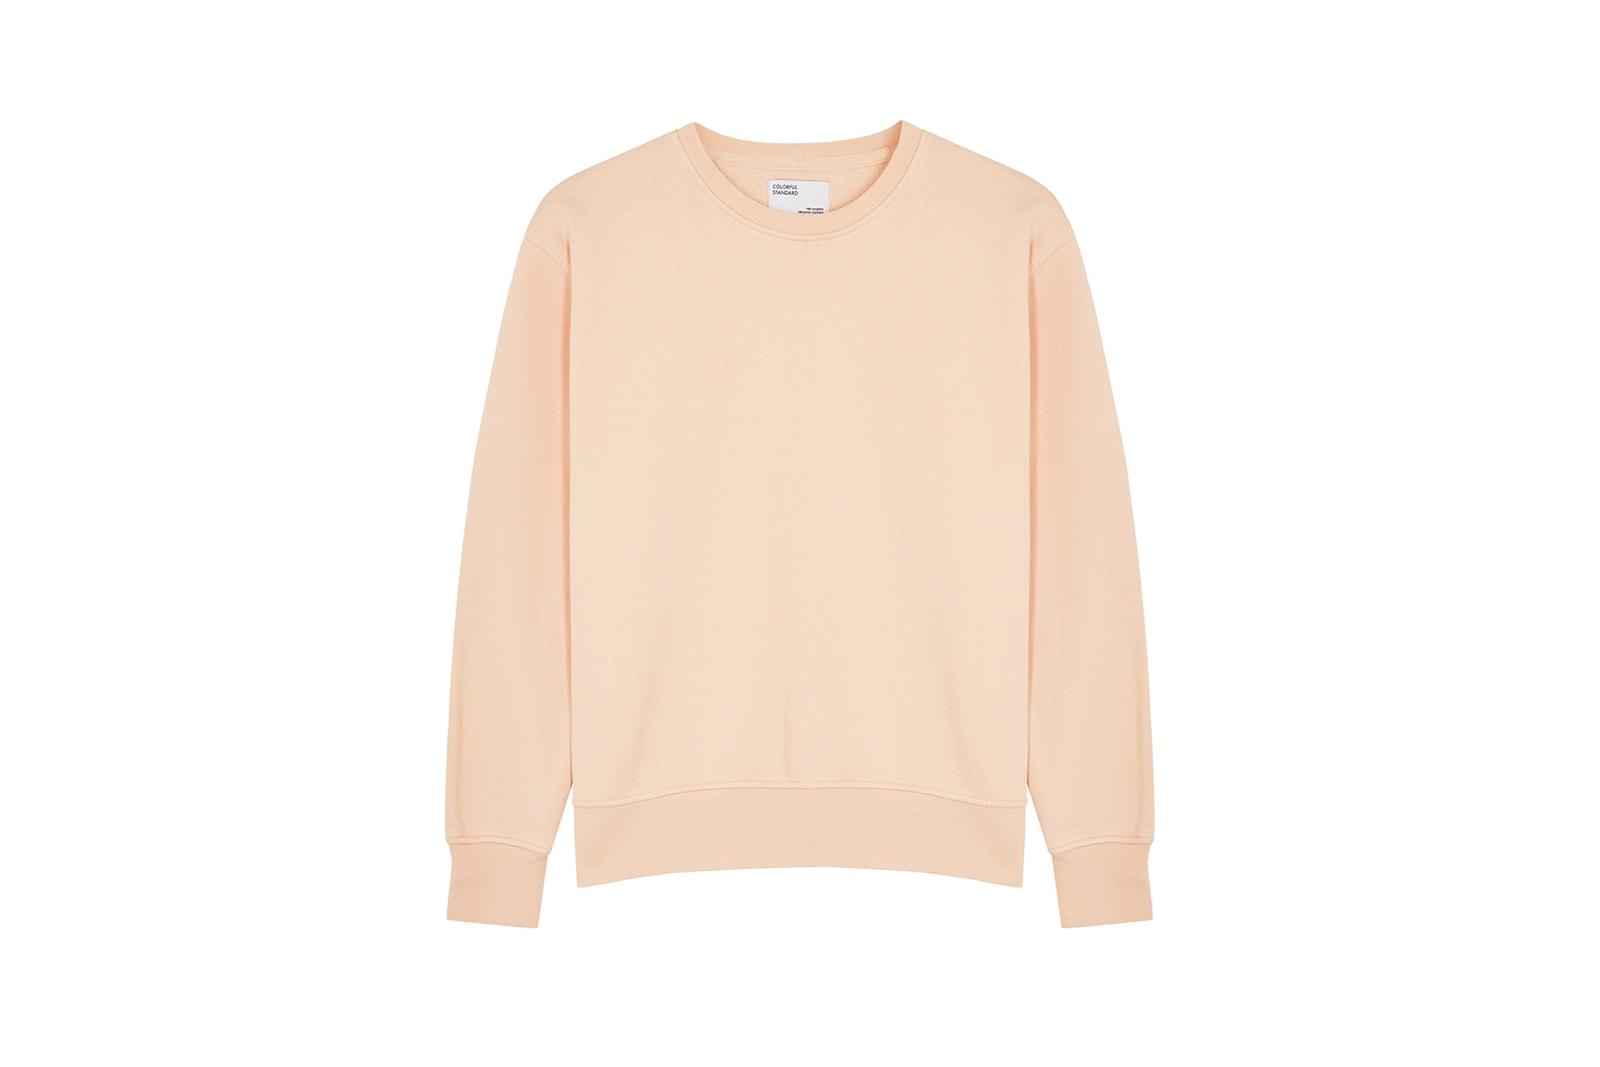 best sustainable loungewear hoodies sweatpants dresses at home nanushka ninety percent pour les femmes navy blue white black